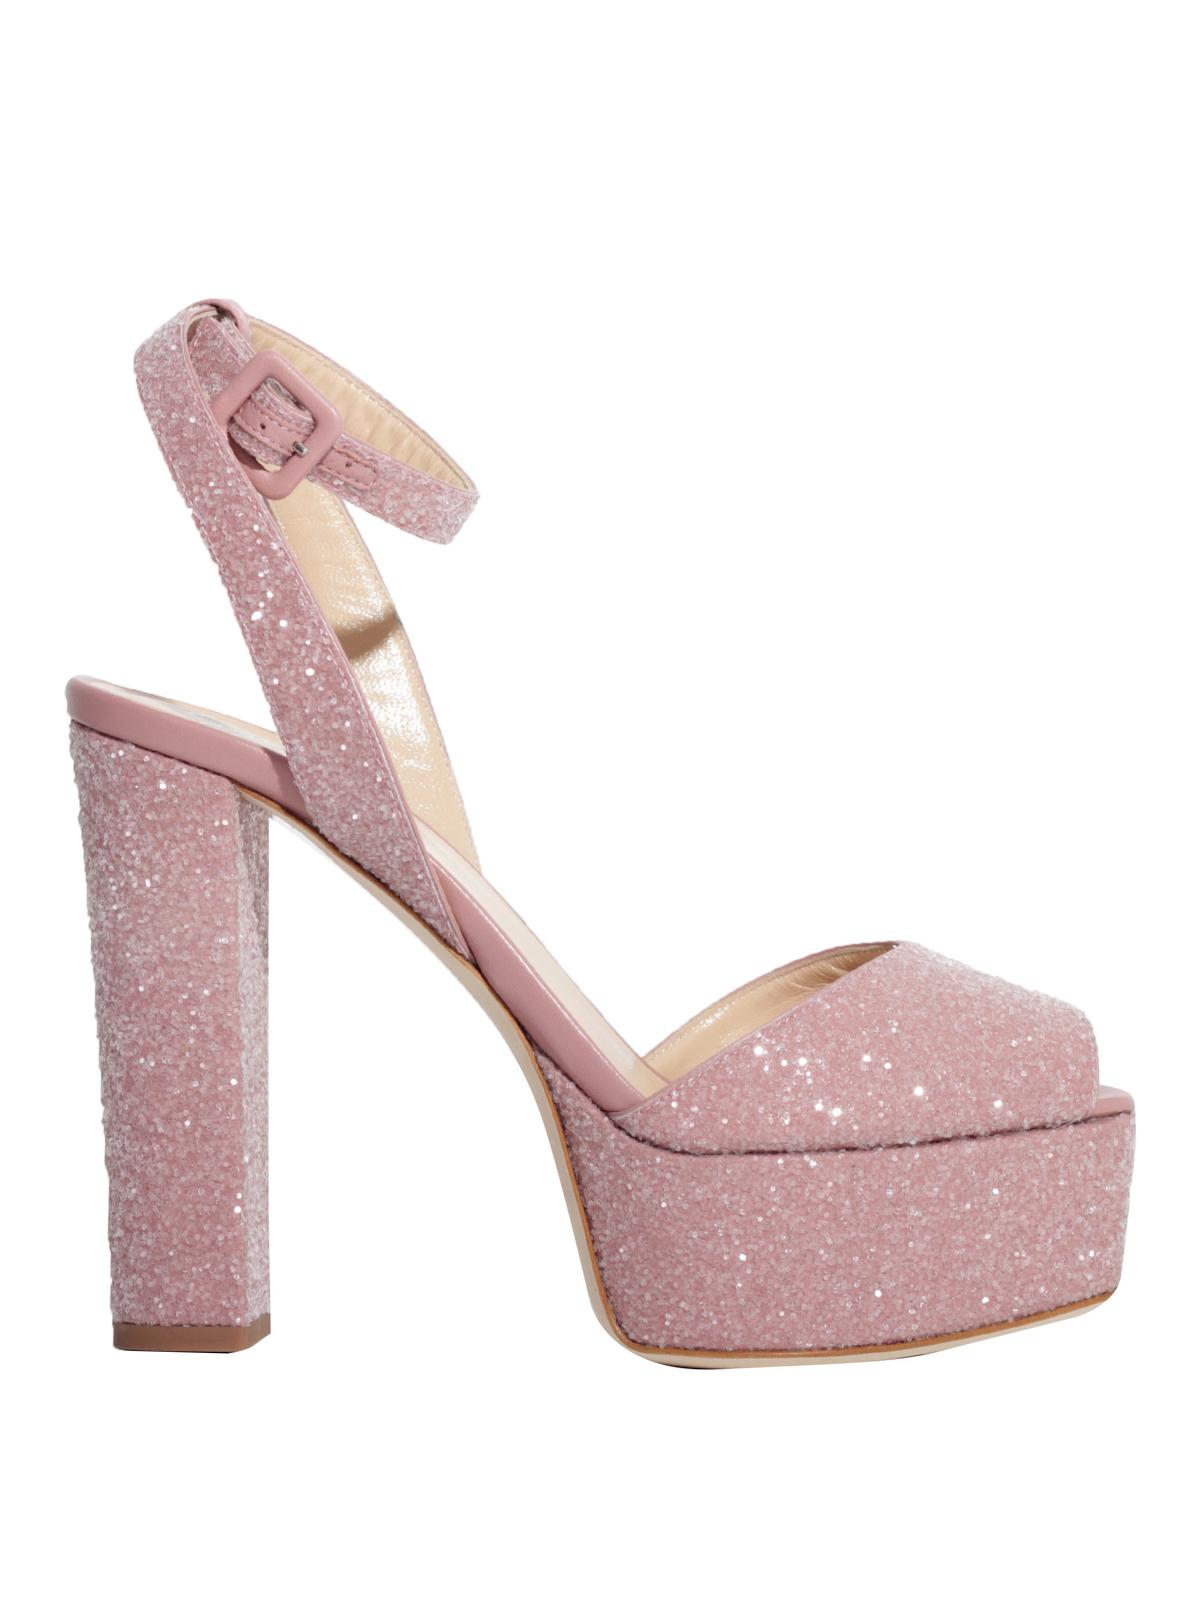 40ffa19f57 Giuseppe Zanotti - Betty platform sandals - sandals - E70035 003